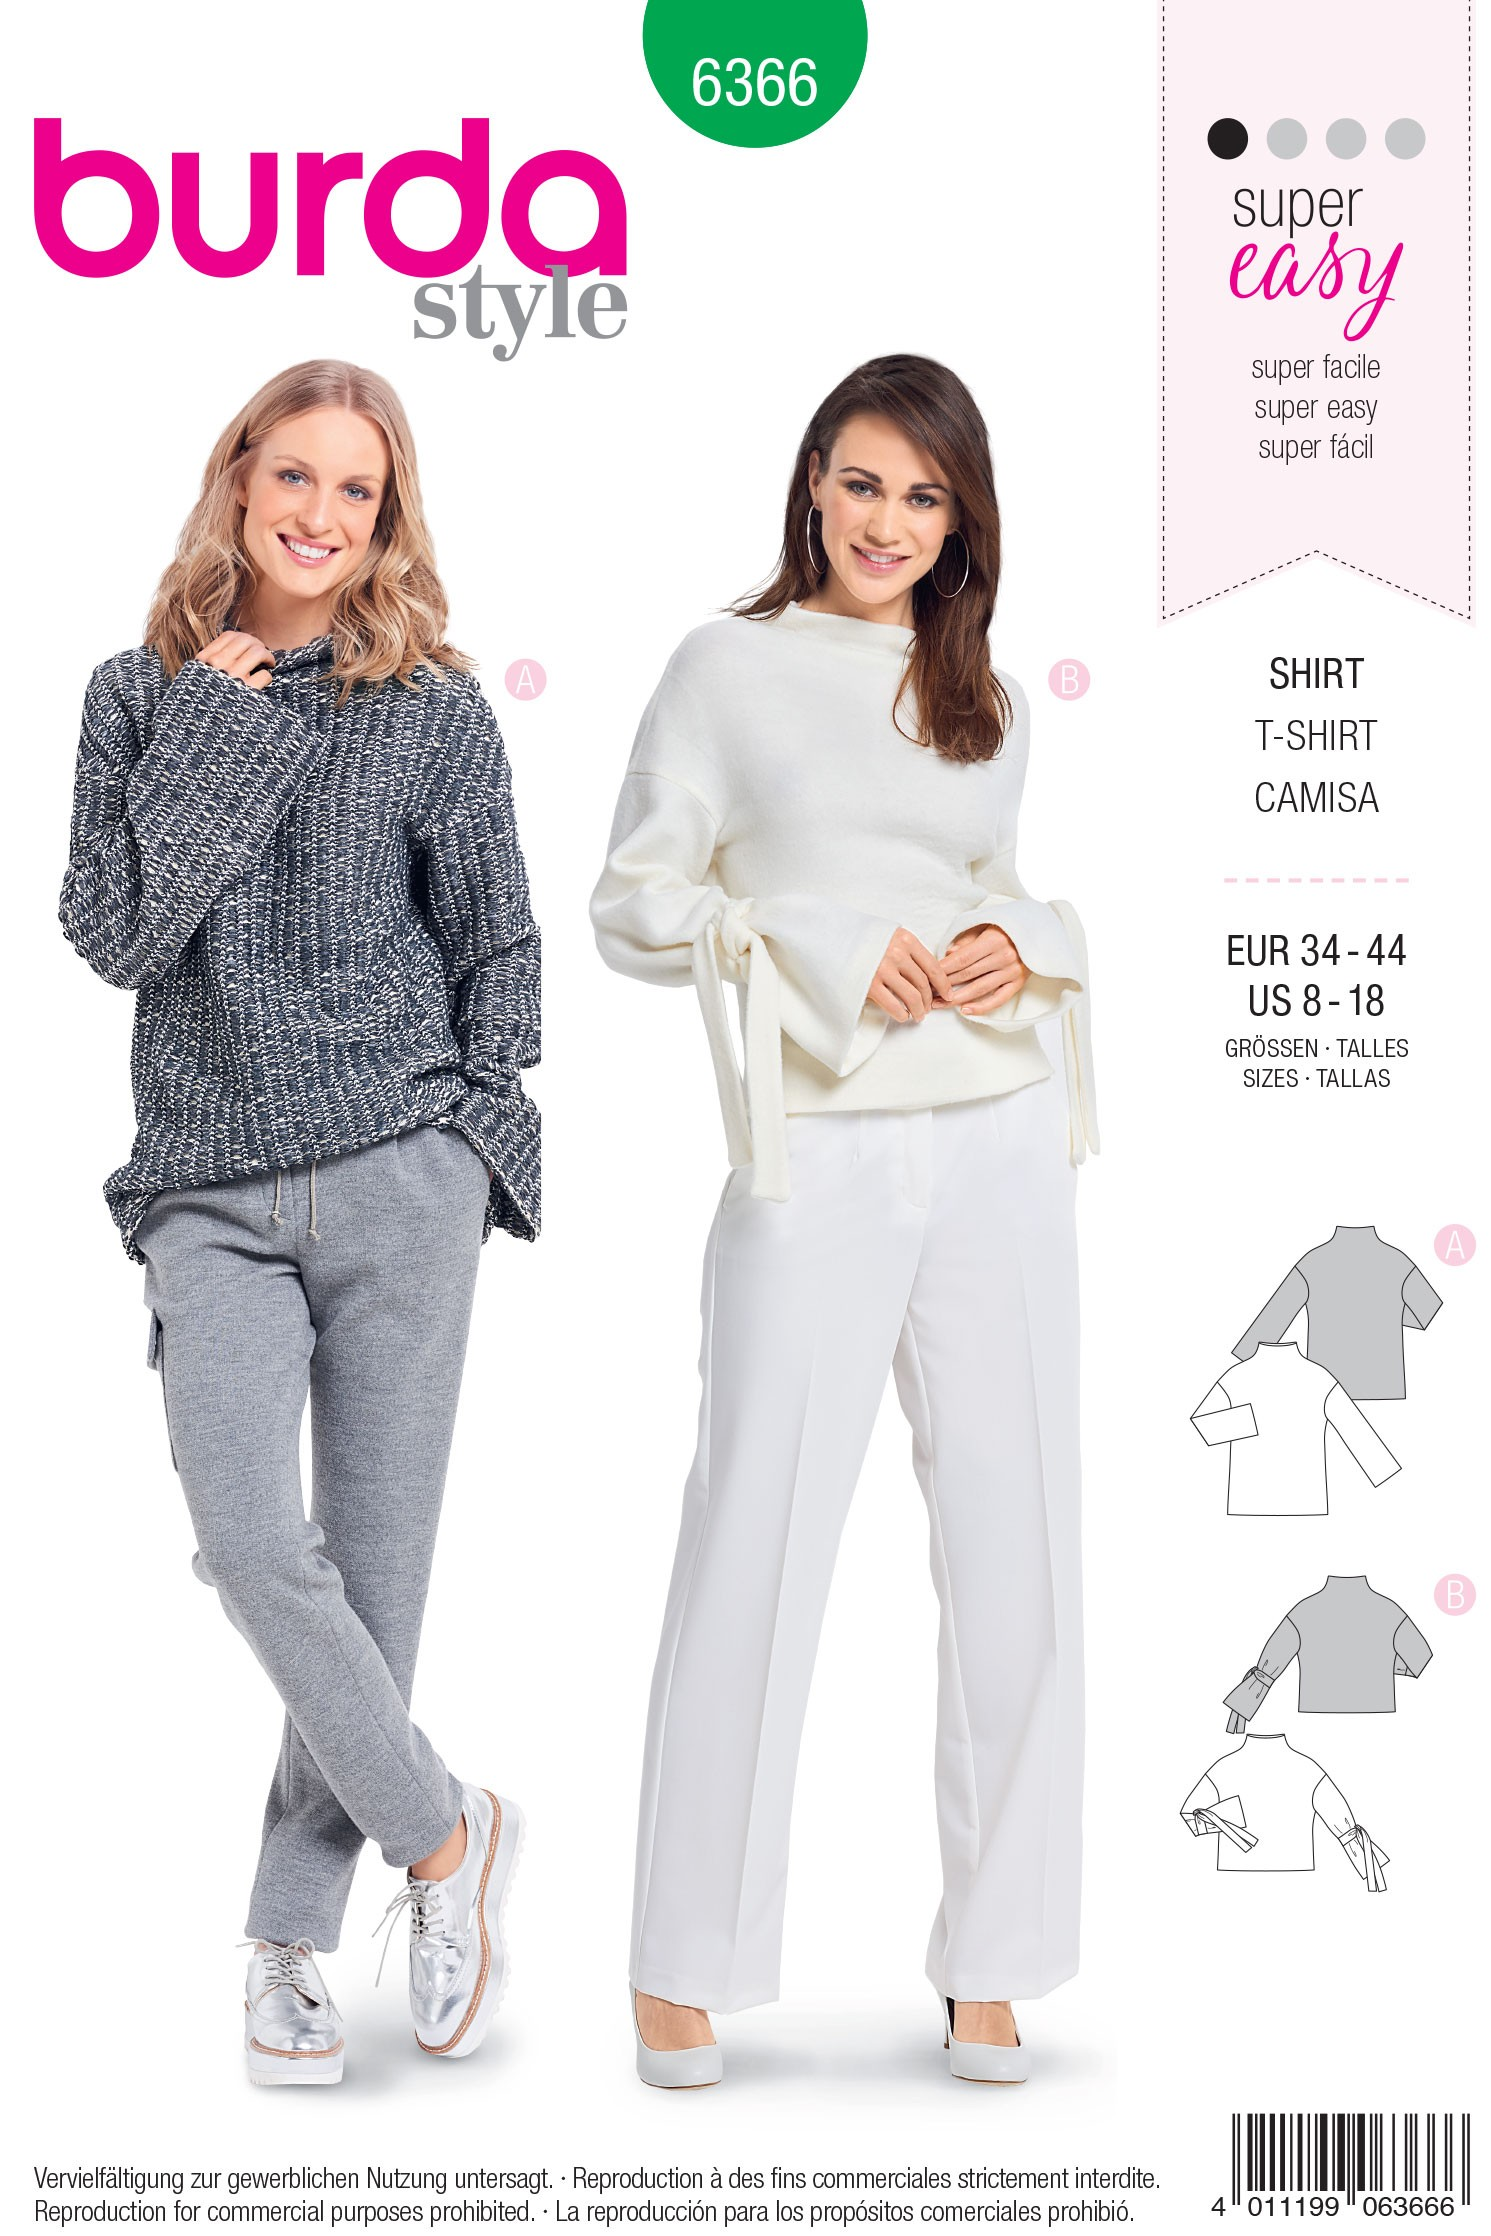 Burda Style Misses' Loose Fitting Feminine Collared Top Sewing Pattern 6366